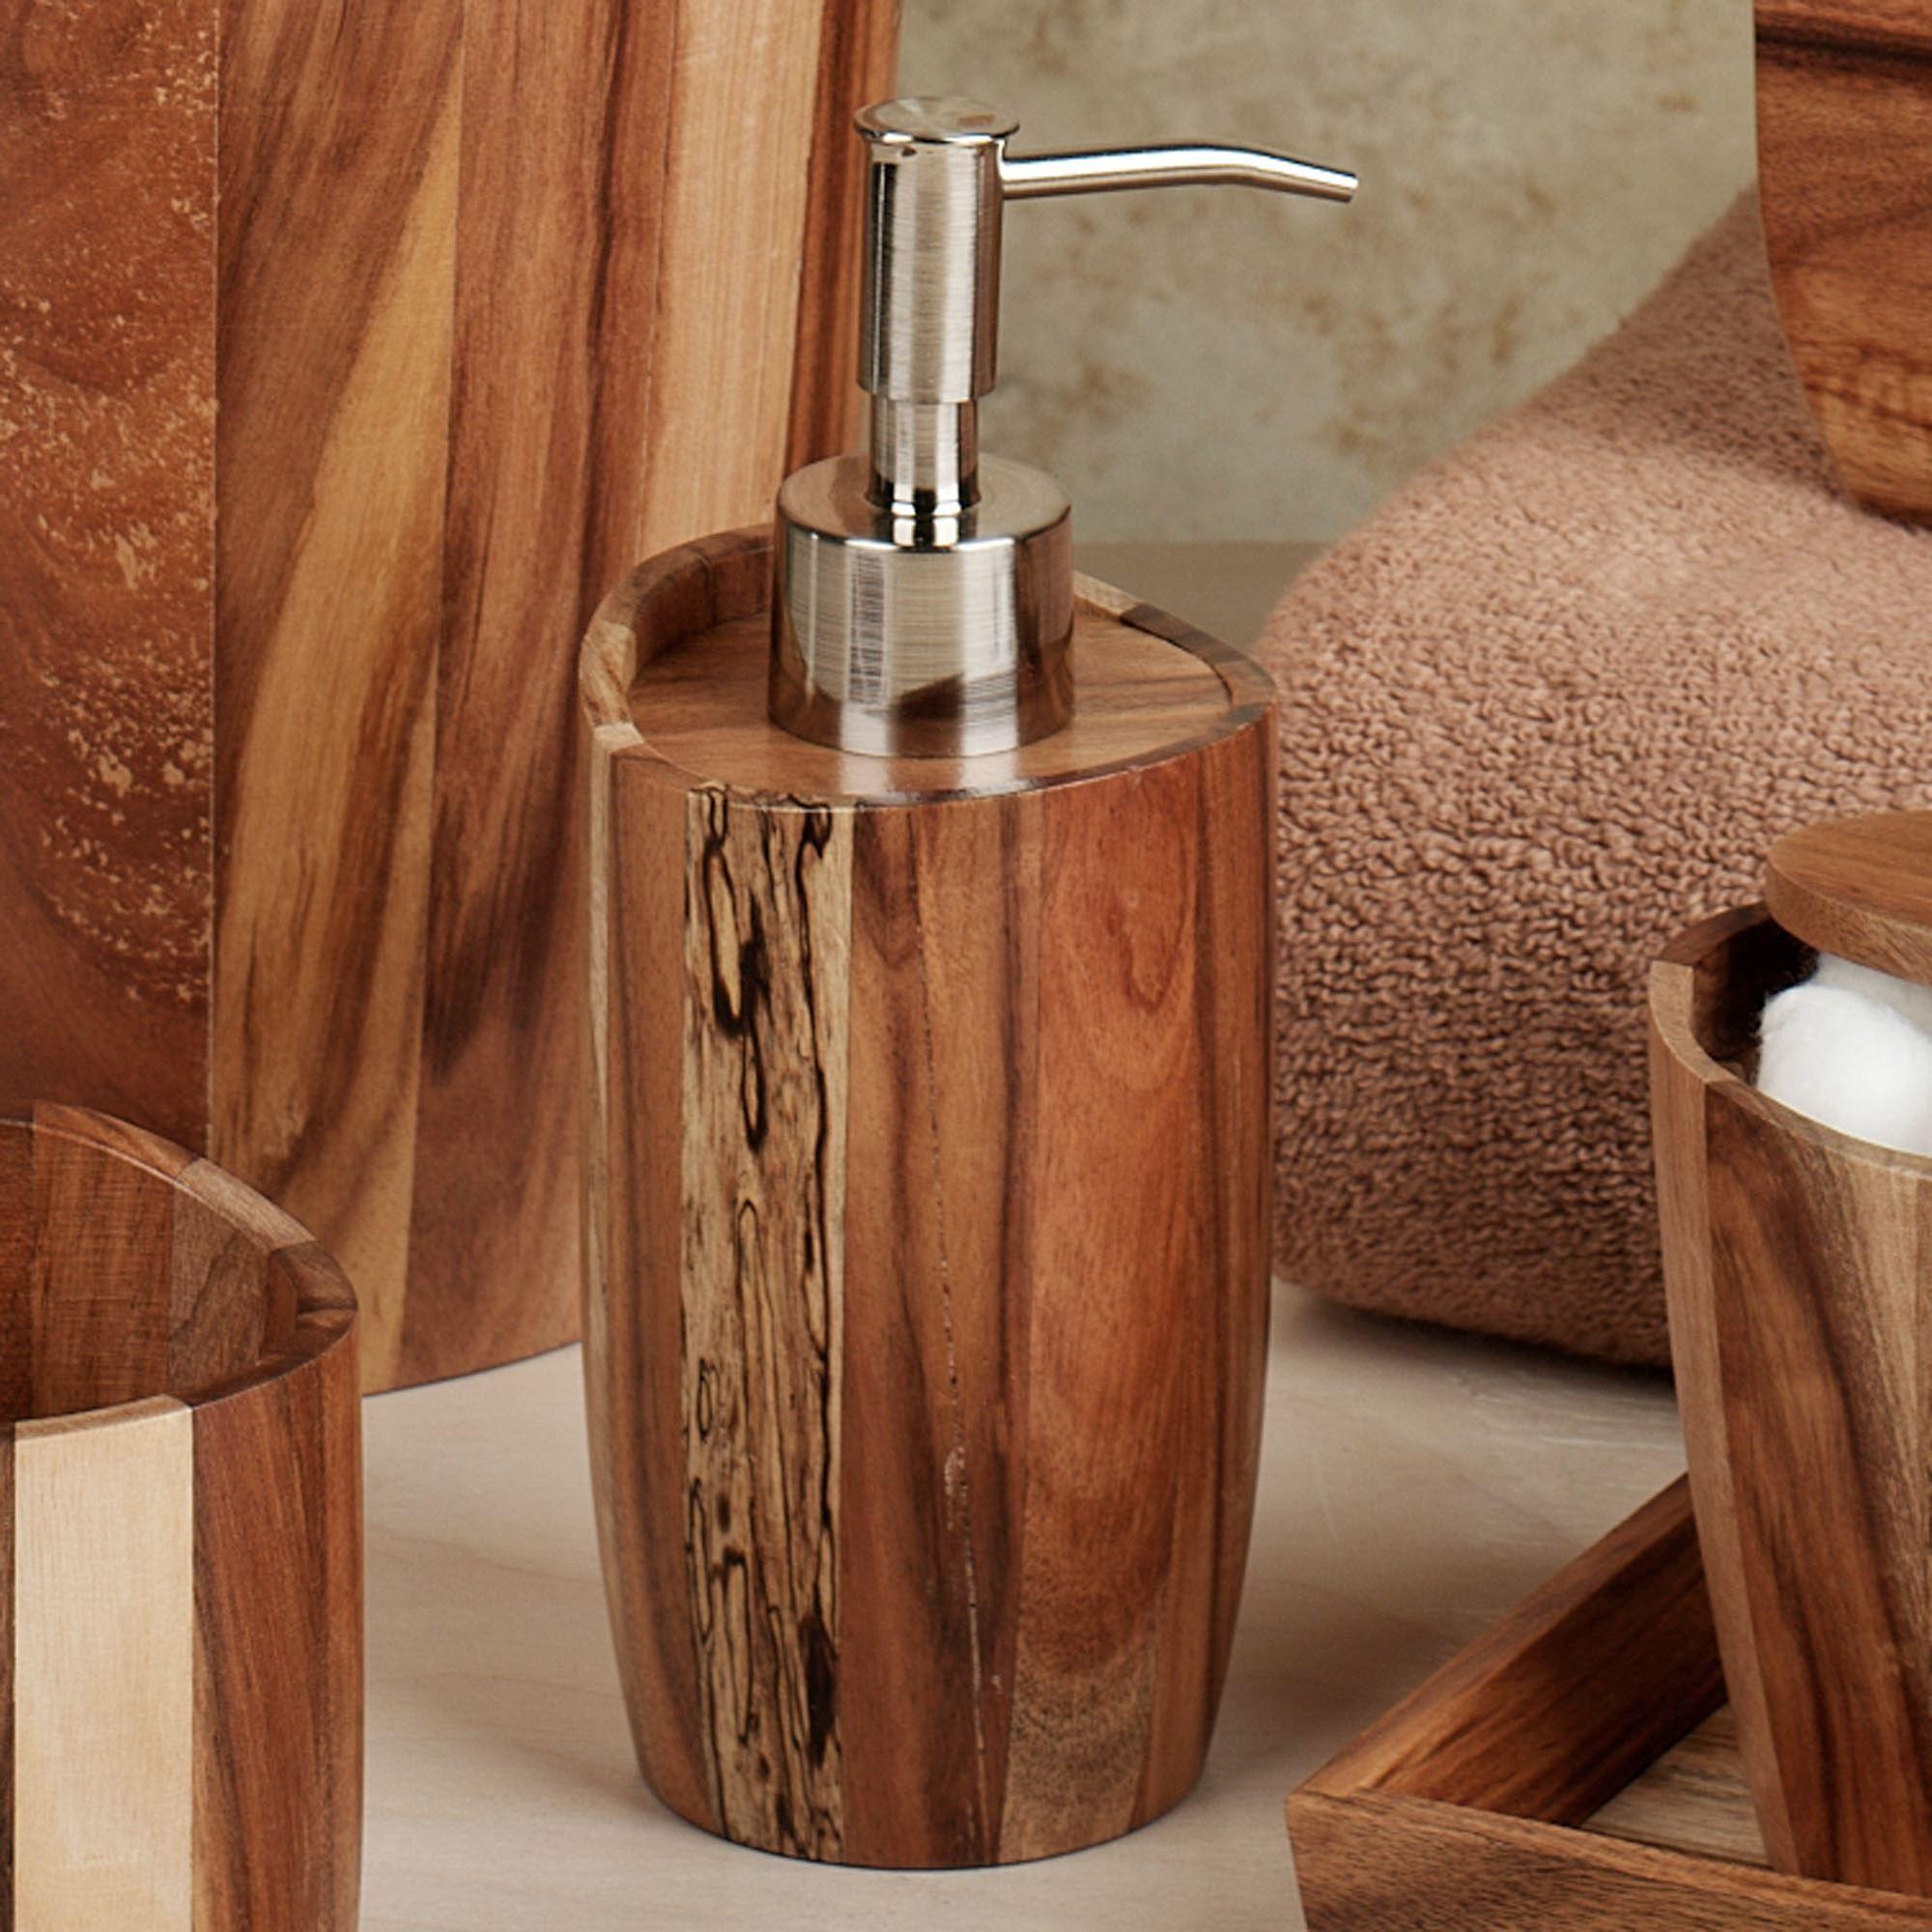 Acacia handcrafted wood bath accessories - Bathroom accessories soap dispenser ...